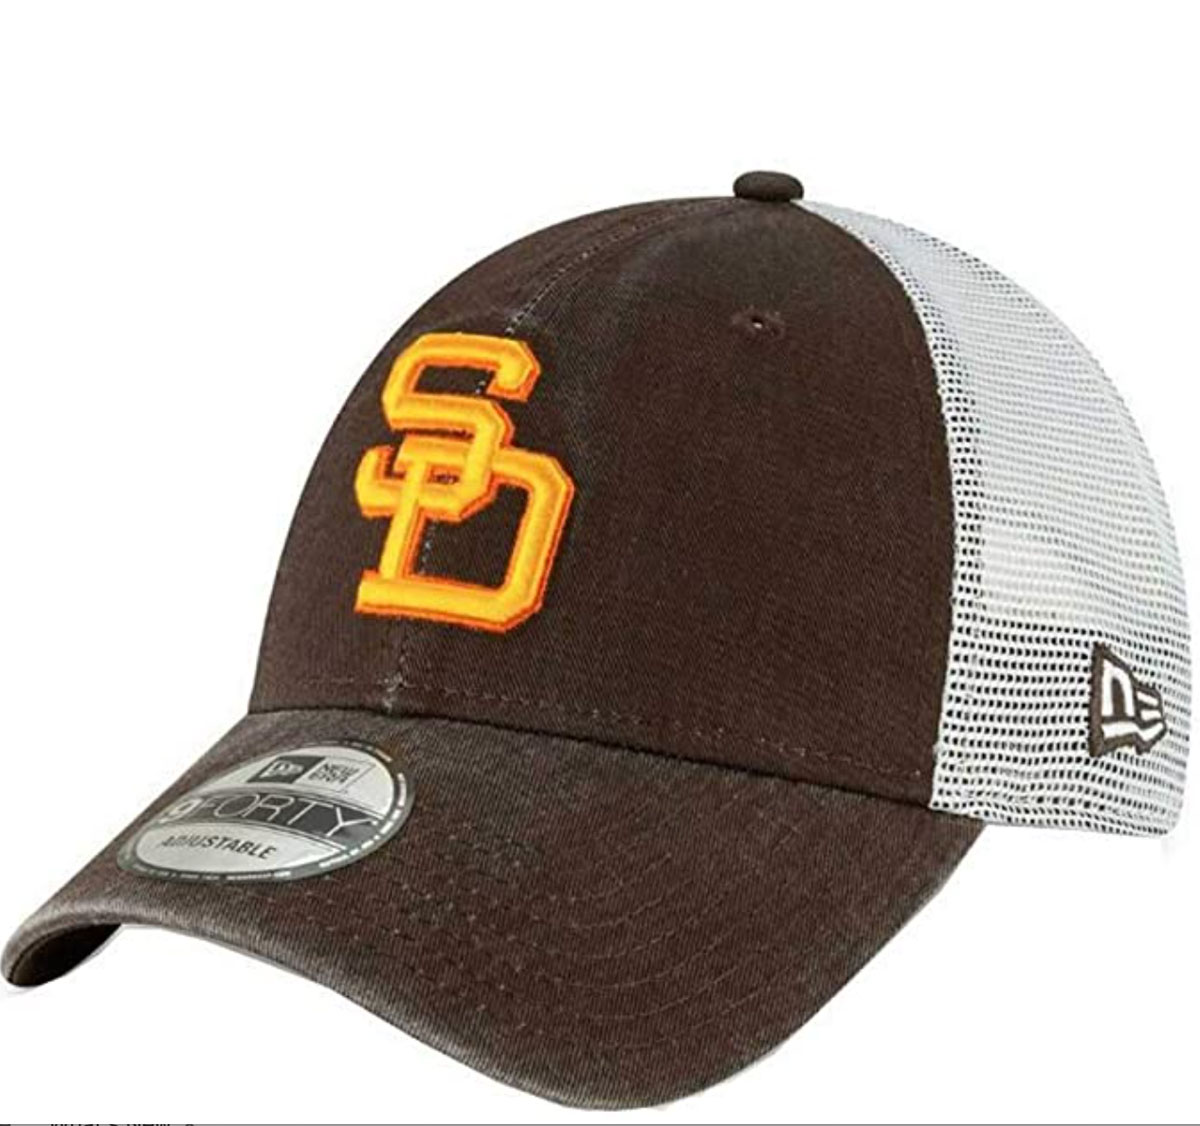 San Diego Padres Snapback Mesh Cap 2014  0ad113af30f